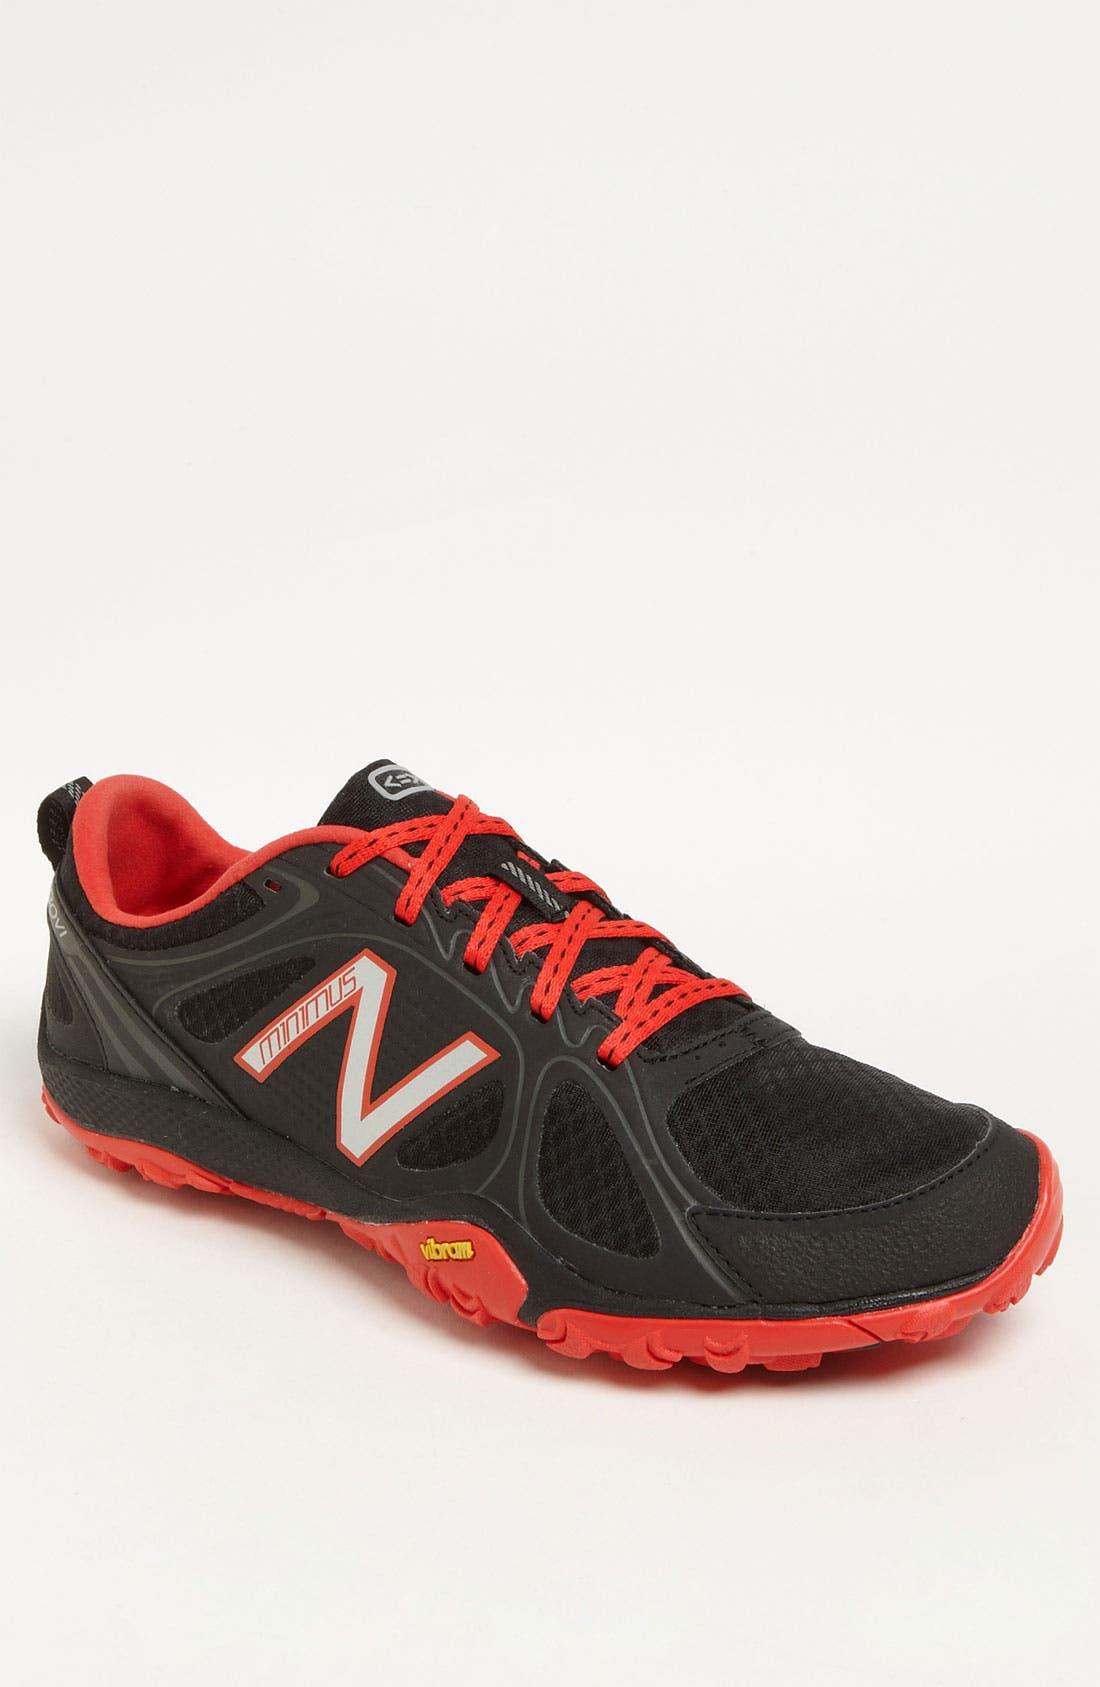 Alternate Image 1 Selected - New Balance 'MO80' Trail Running Shoe (Men)